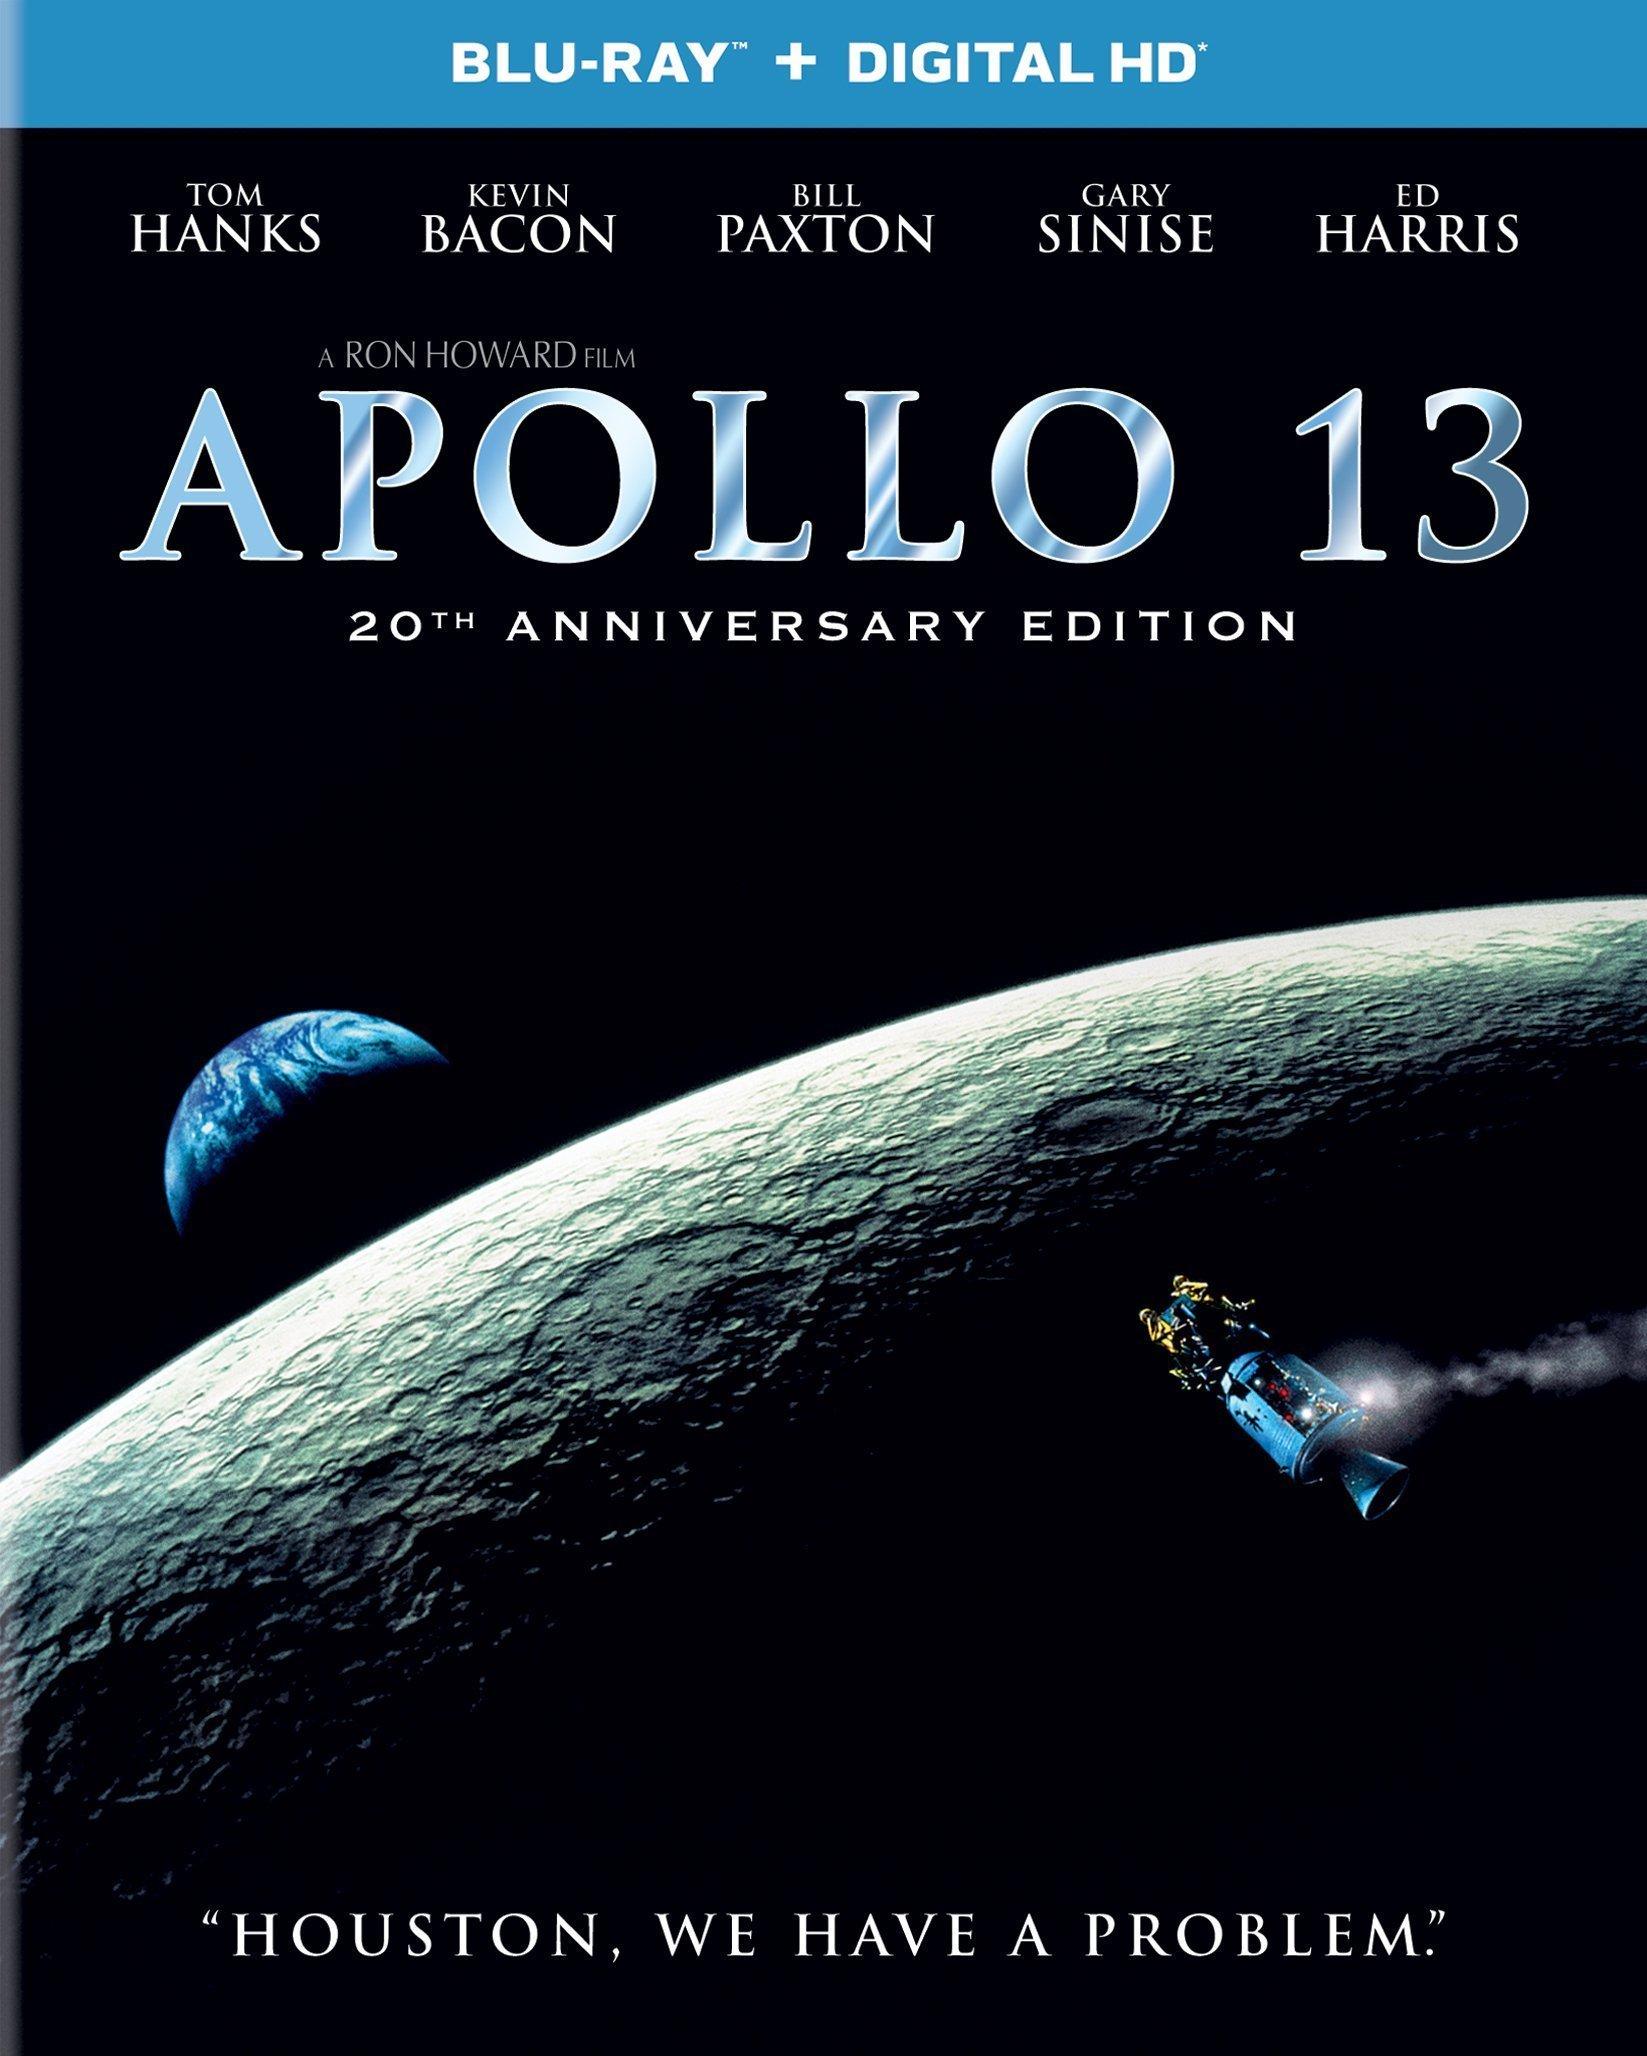 Apollo 13 Blu-ray Review